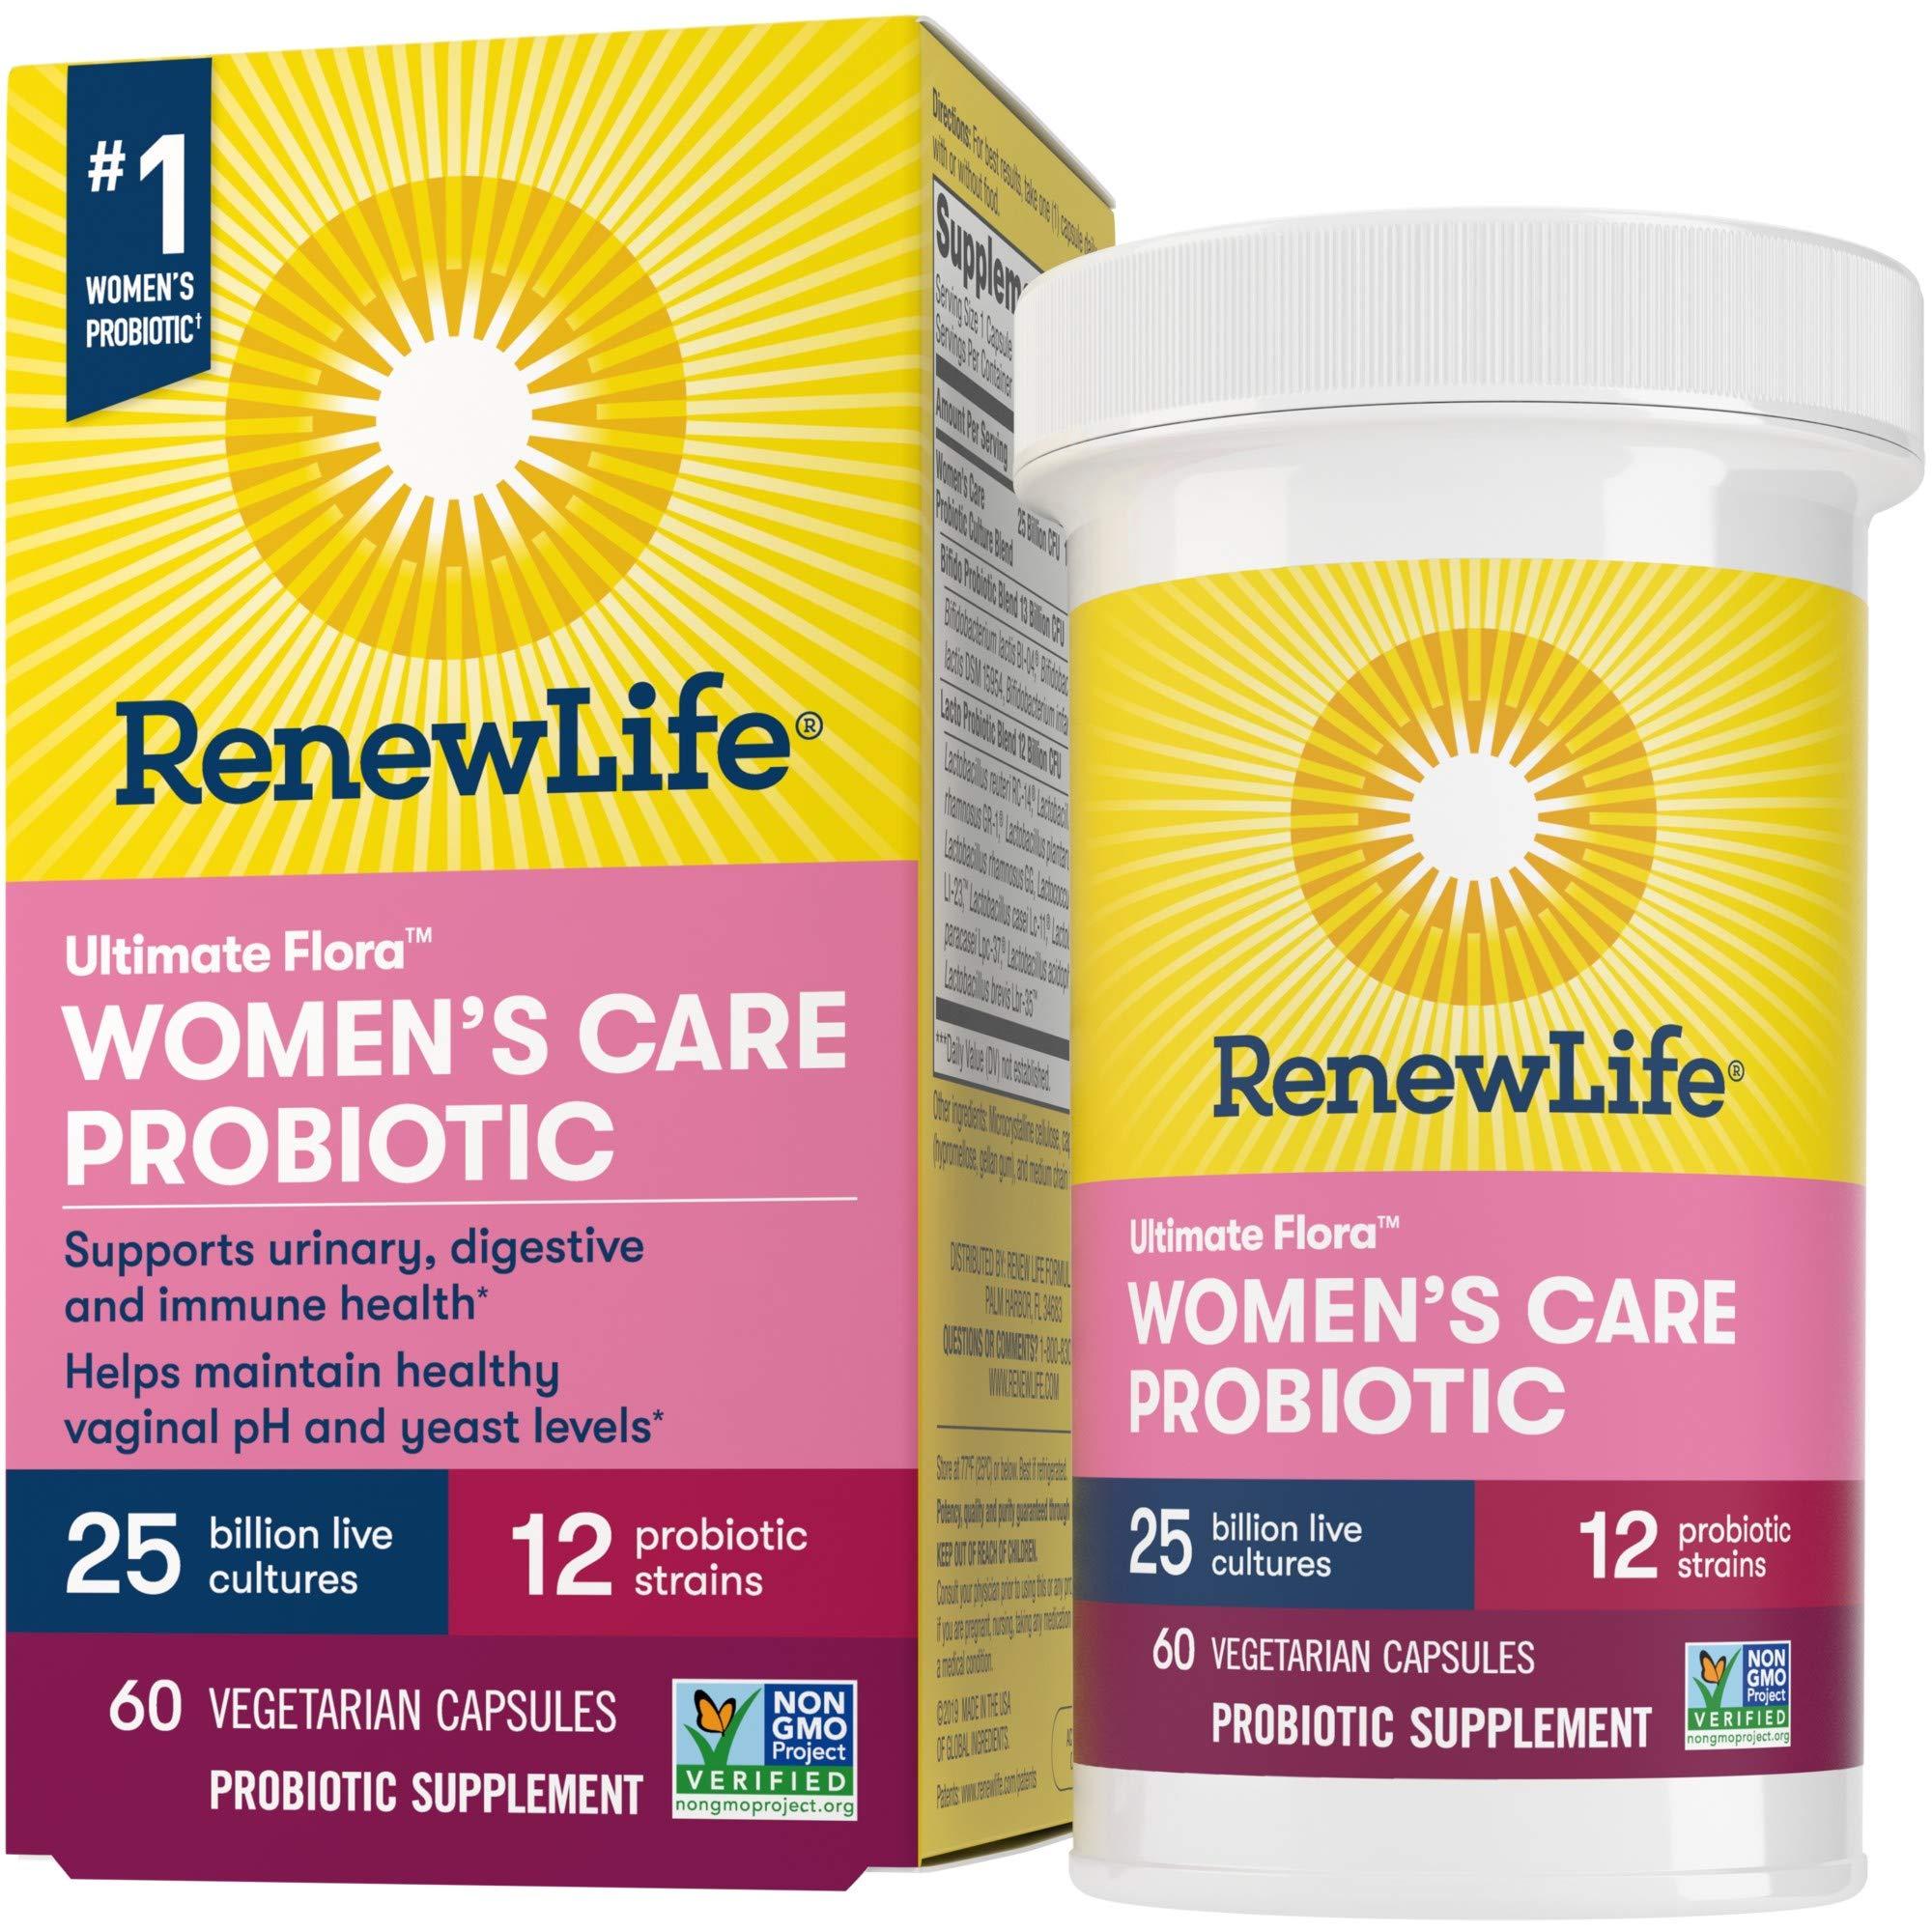 Renew Life #1 Women's Probiotics 25 Billion CFU Guaranteed, 12 Strains, Shelf Stable, Gluten Dairy & Soy Free, 60 Capsules, Feminine Health, Ultimate Flora Women's Care-60 Day Money Back Guarantee